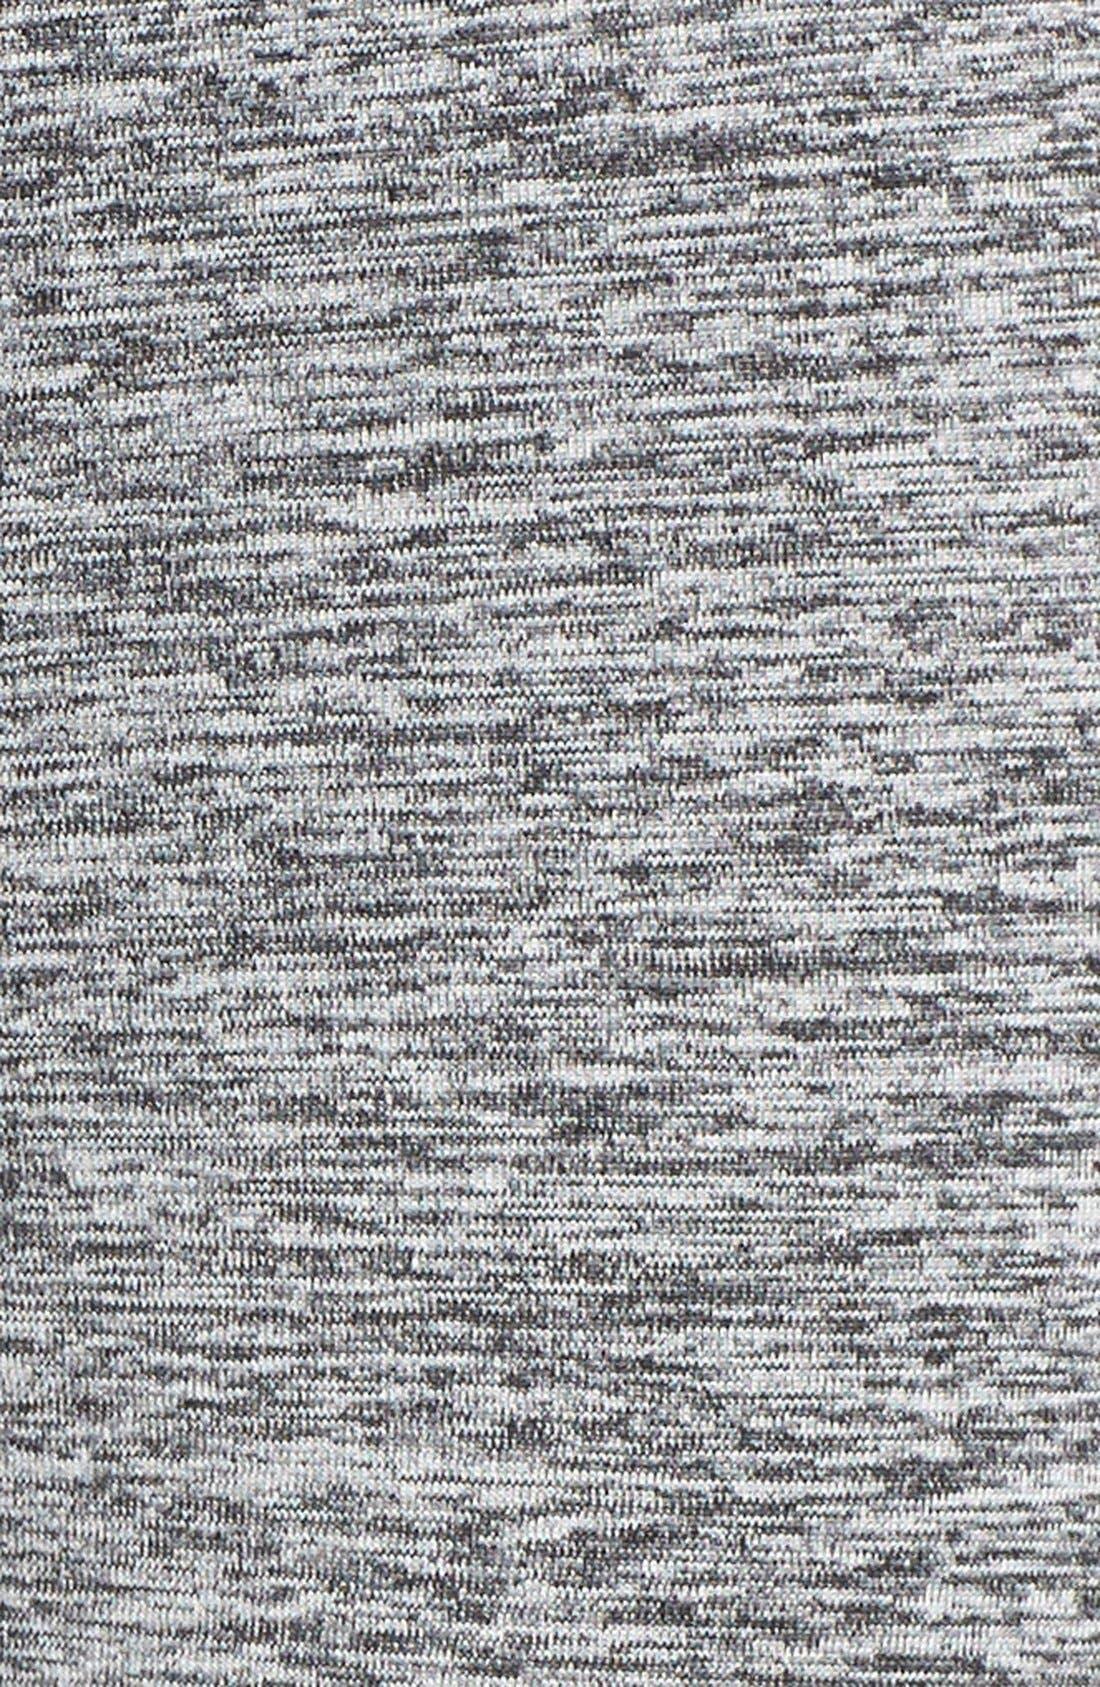 Heat It Up Reflective Running Leggings,                             Alternate thumbnail 5, color,                             Black Melange